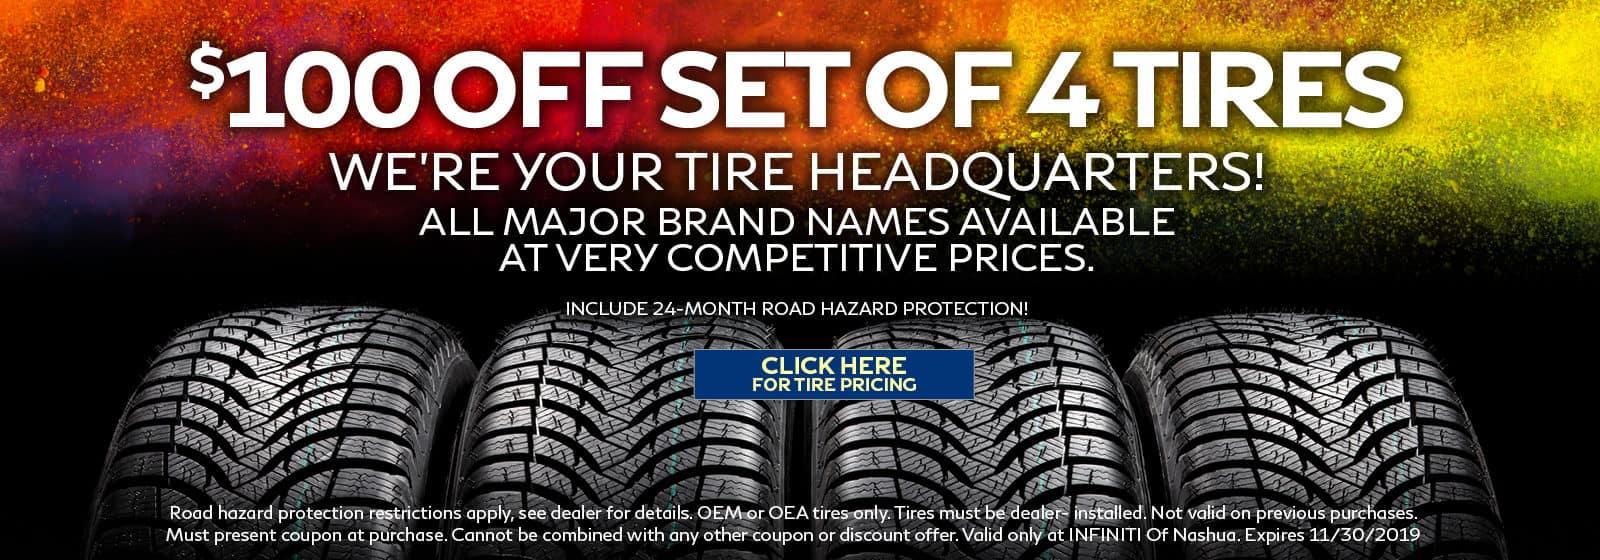 $100 off set of 4 tires